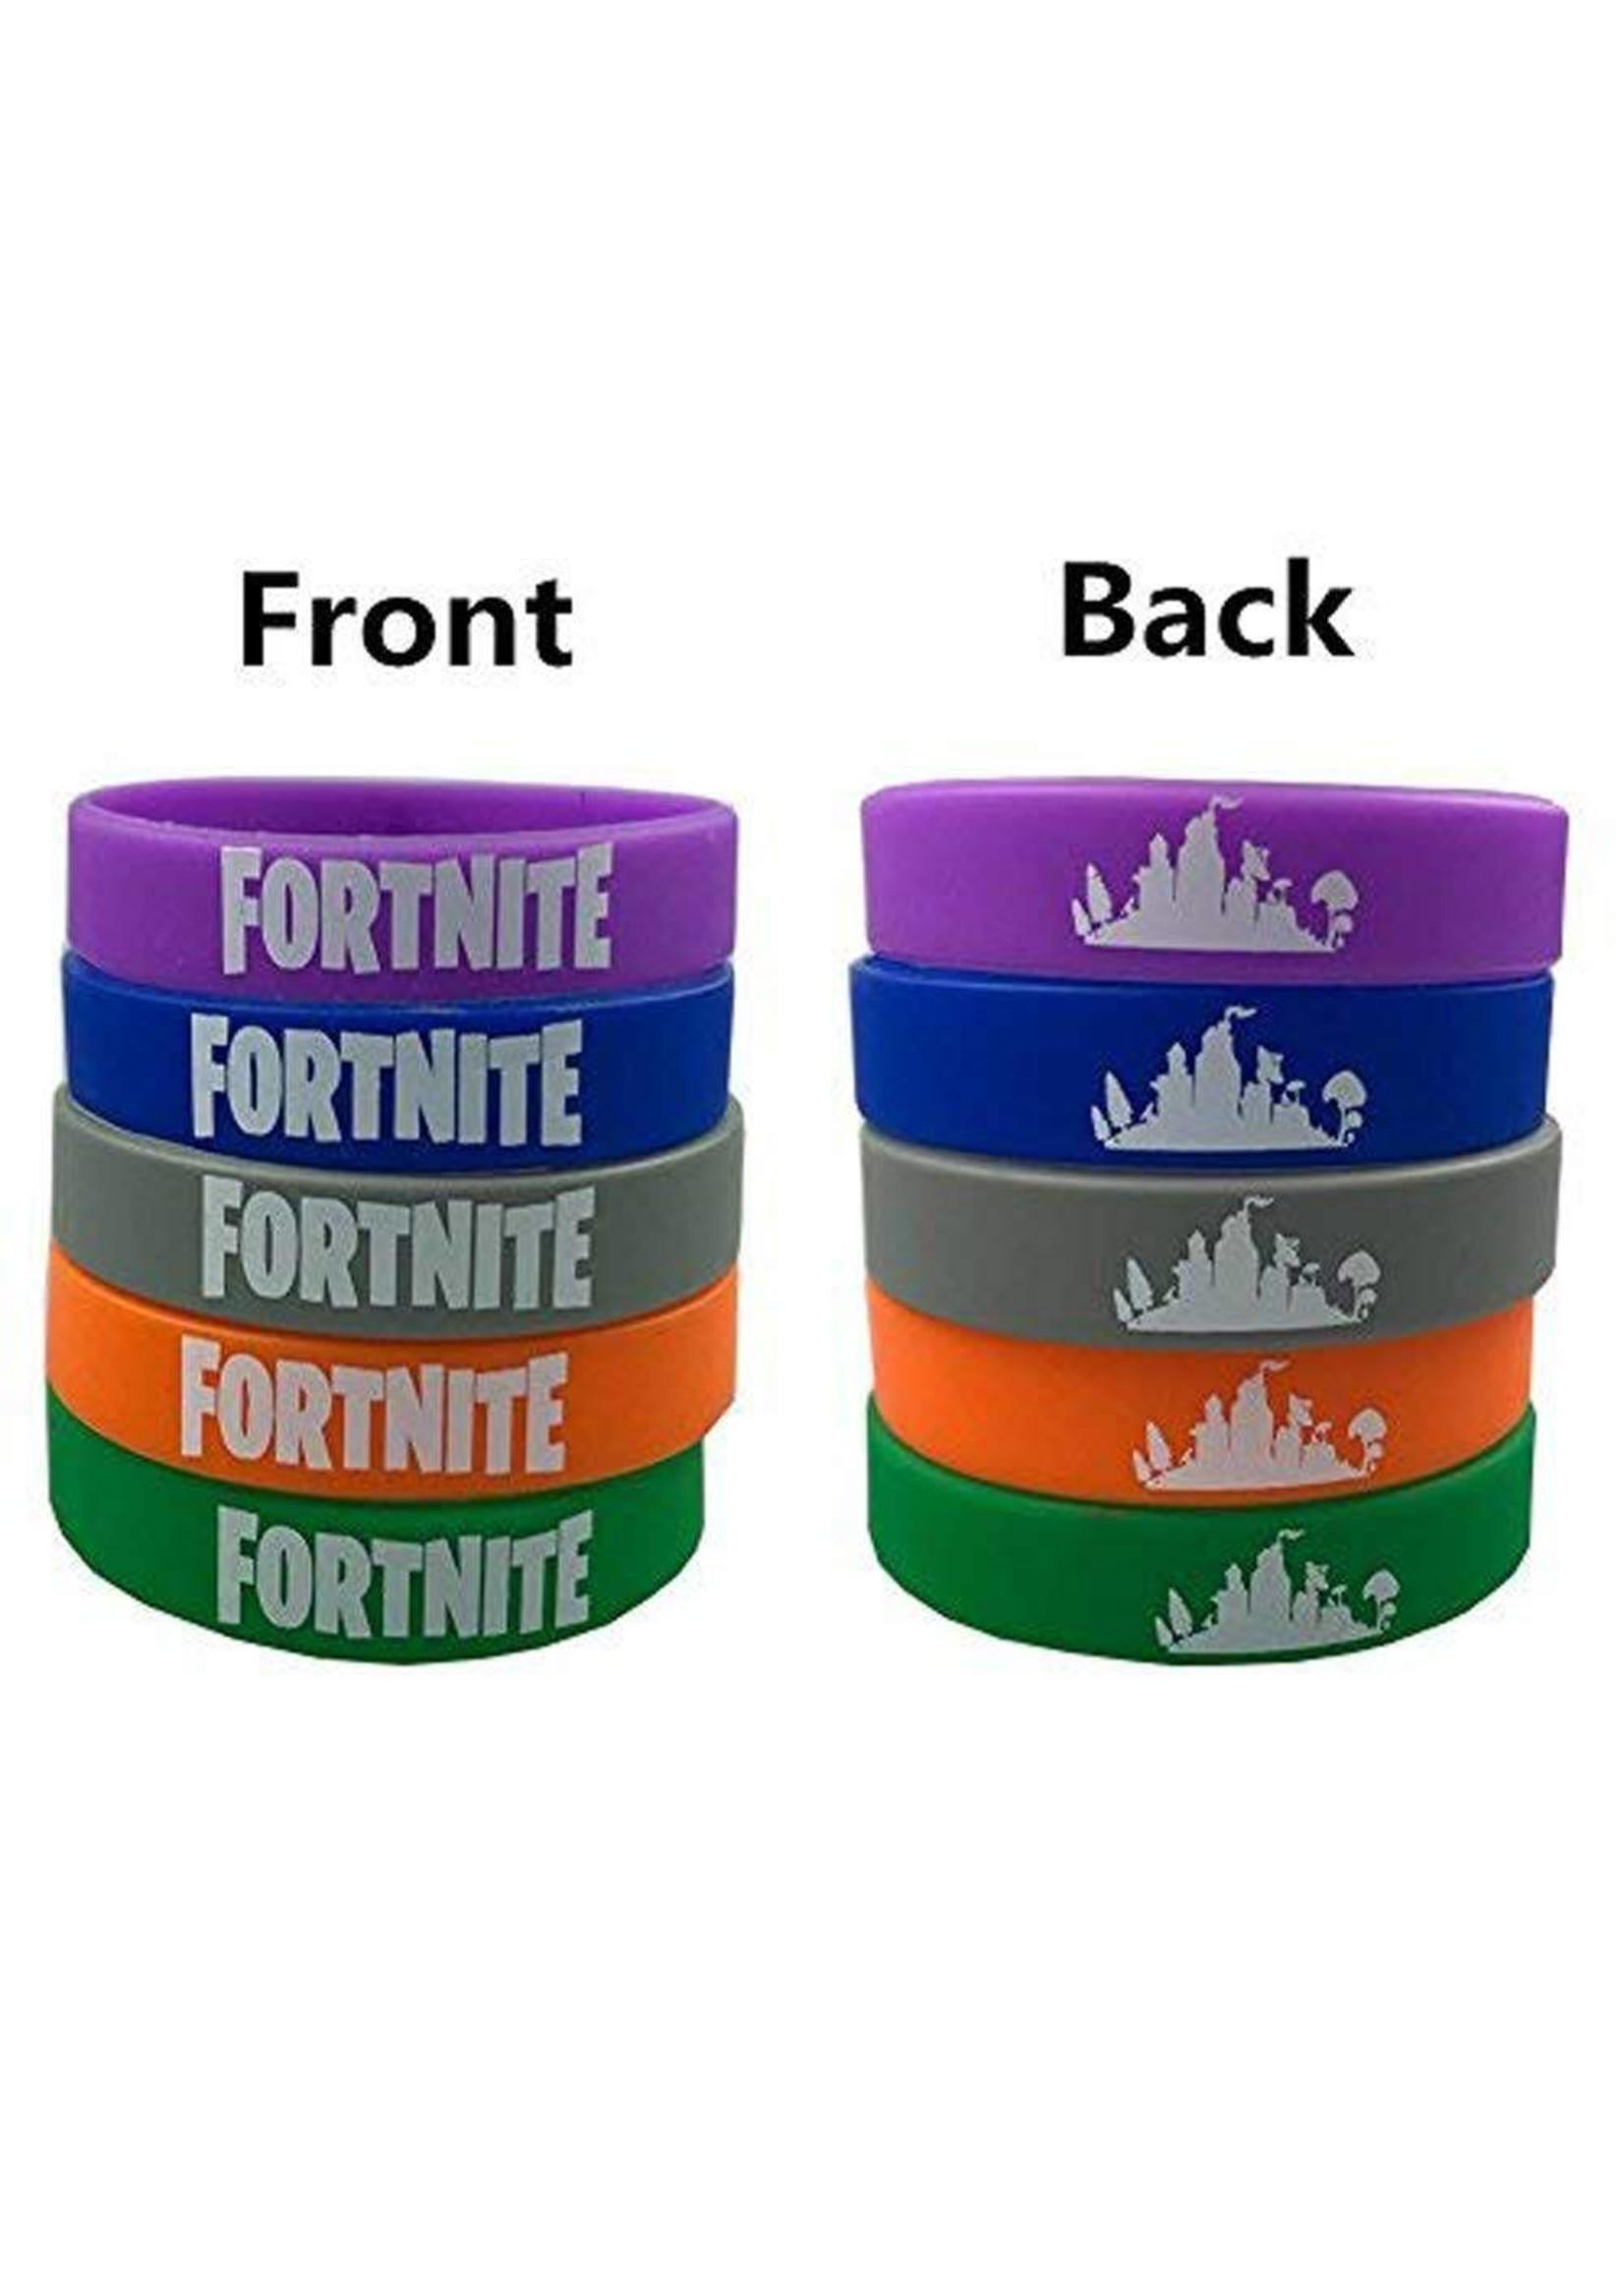 $5 Wrist Band Bracelet (1 PC) (Fortnite / Game / Motivational)